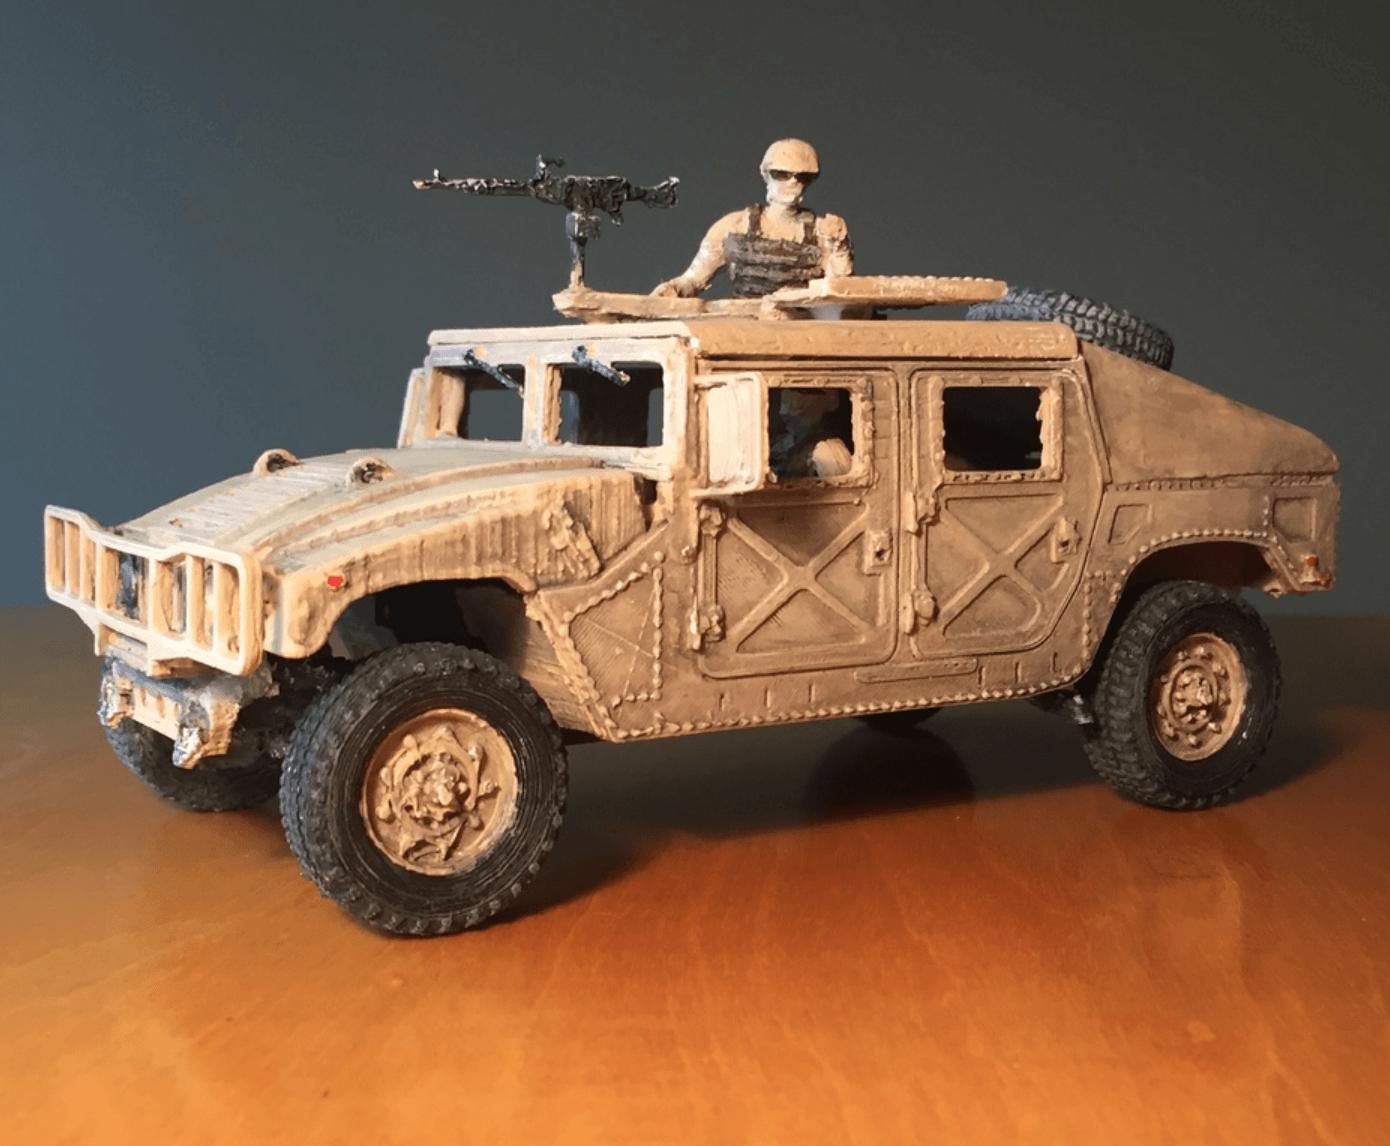 Capture d'écran 2018-03-30 à 16.07.38.png Download STL file HUMMER H1 - Assembly model kit 1:35 • 3D print model, guillesilvestrini